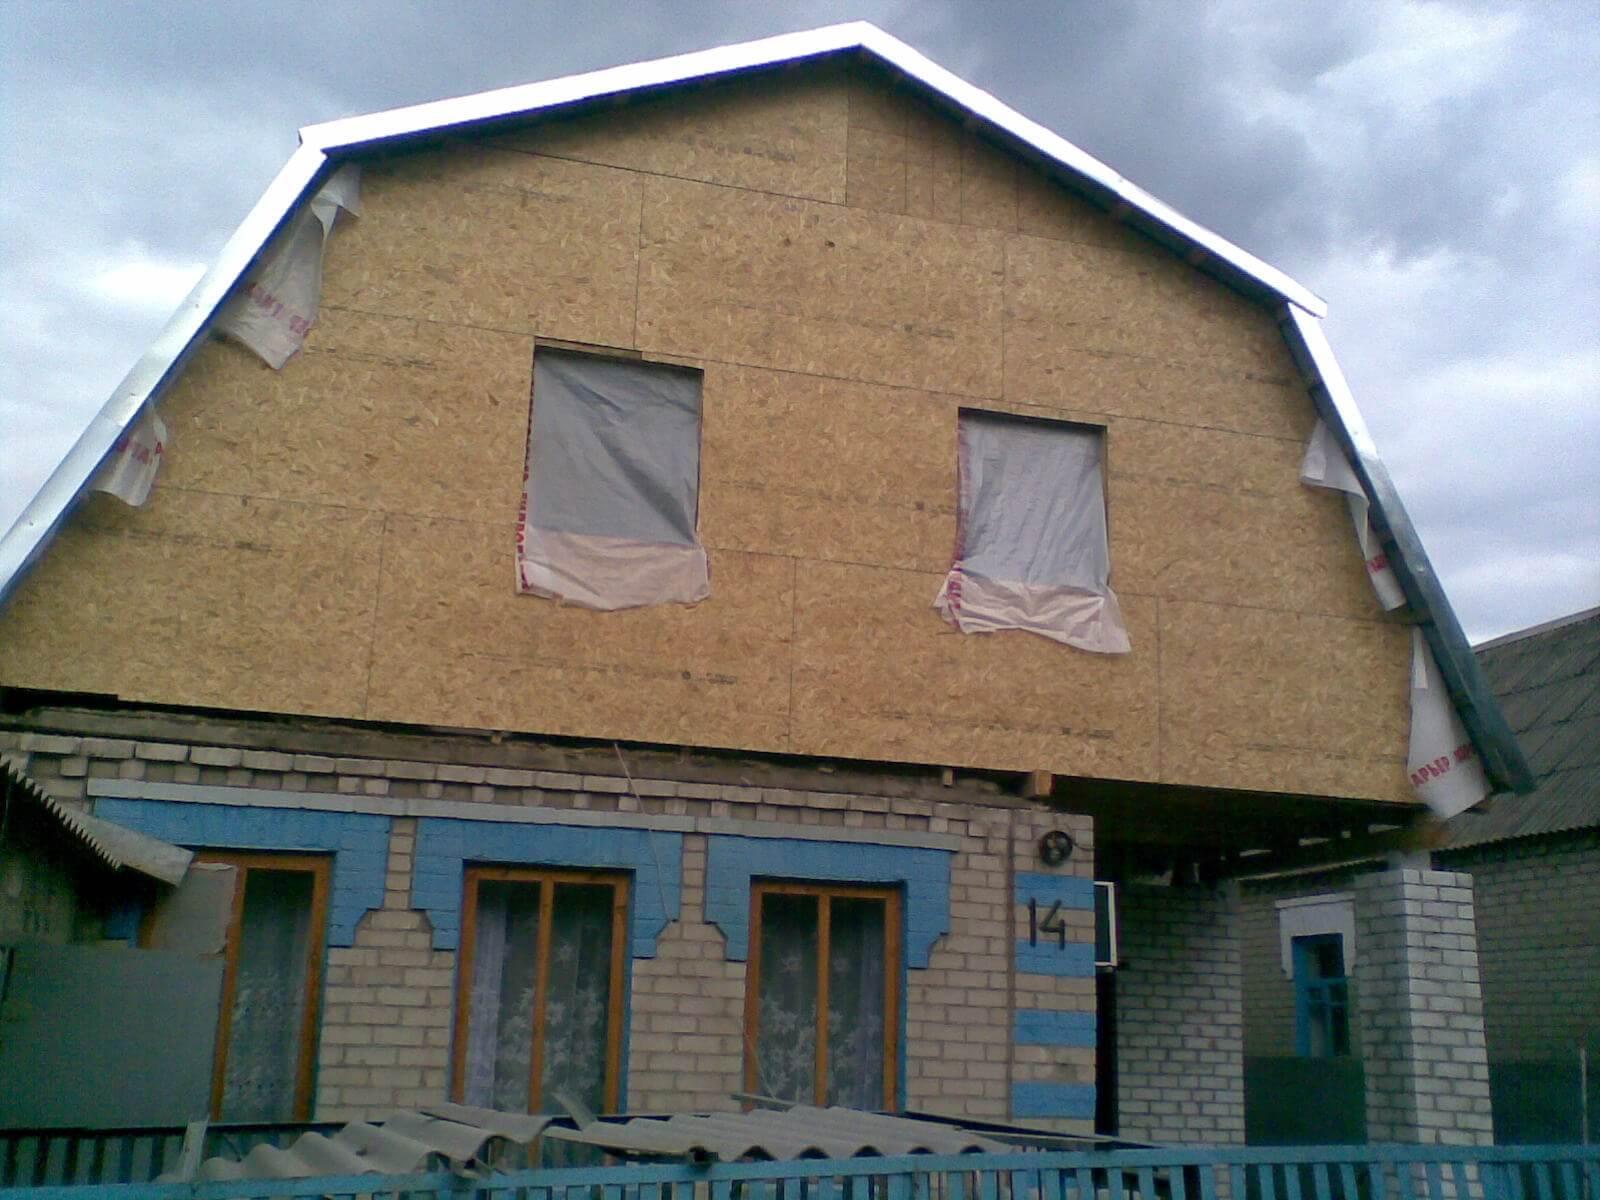 балконом фронтон фото с мансарда